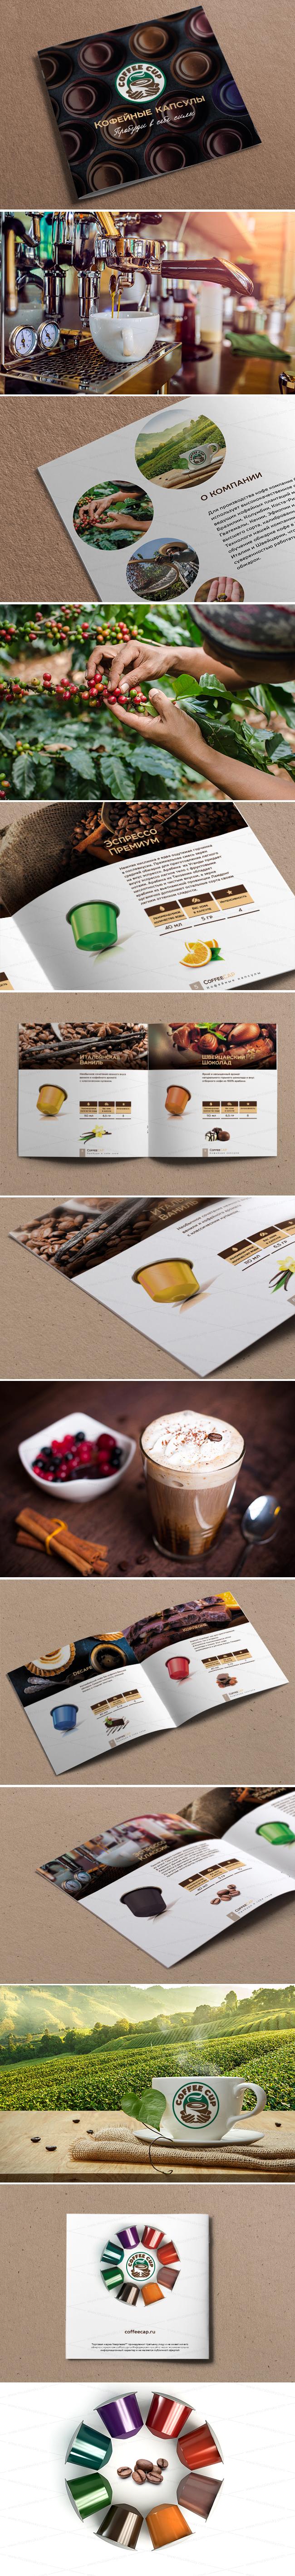 Catalog_Coffeecap_my